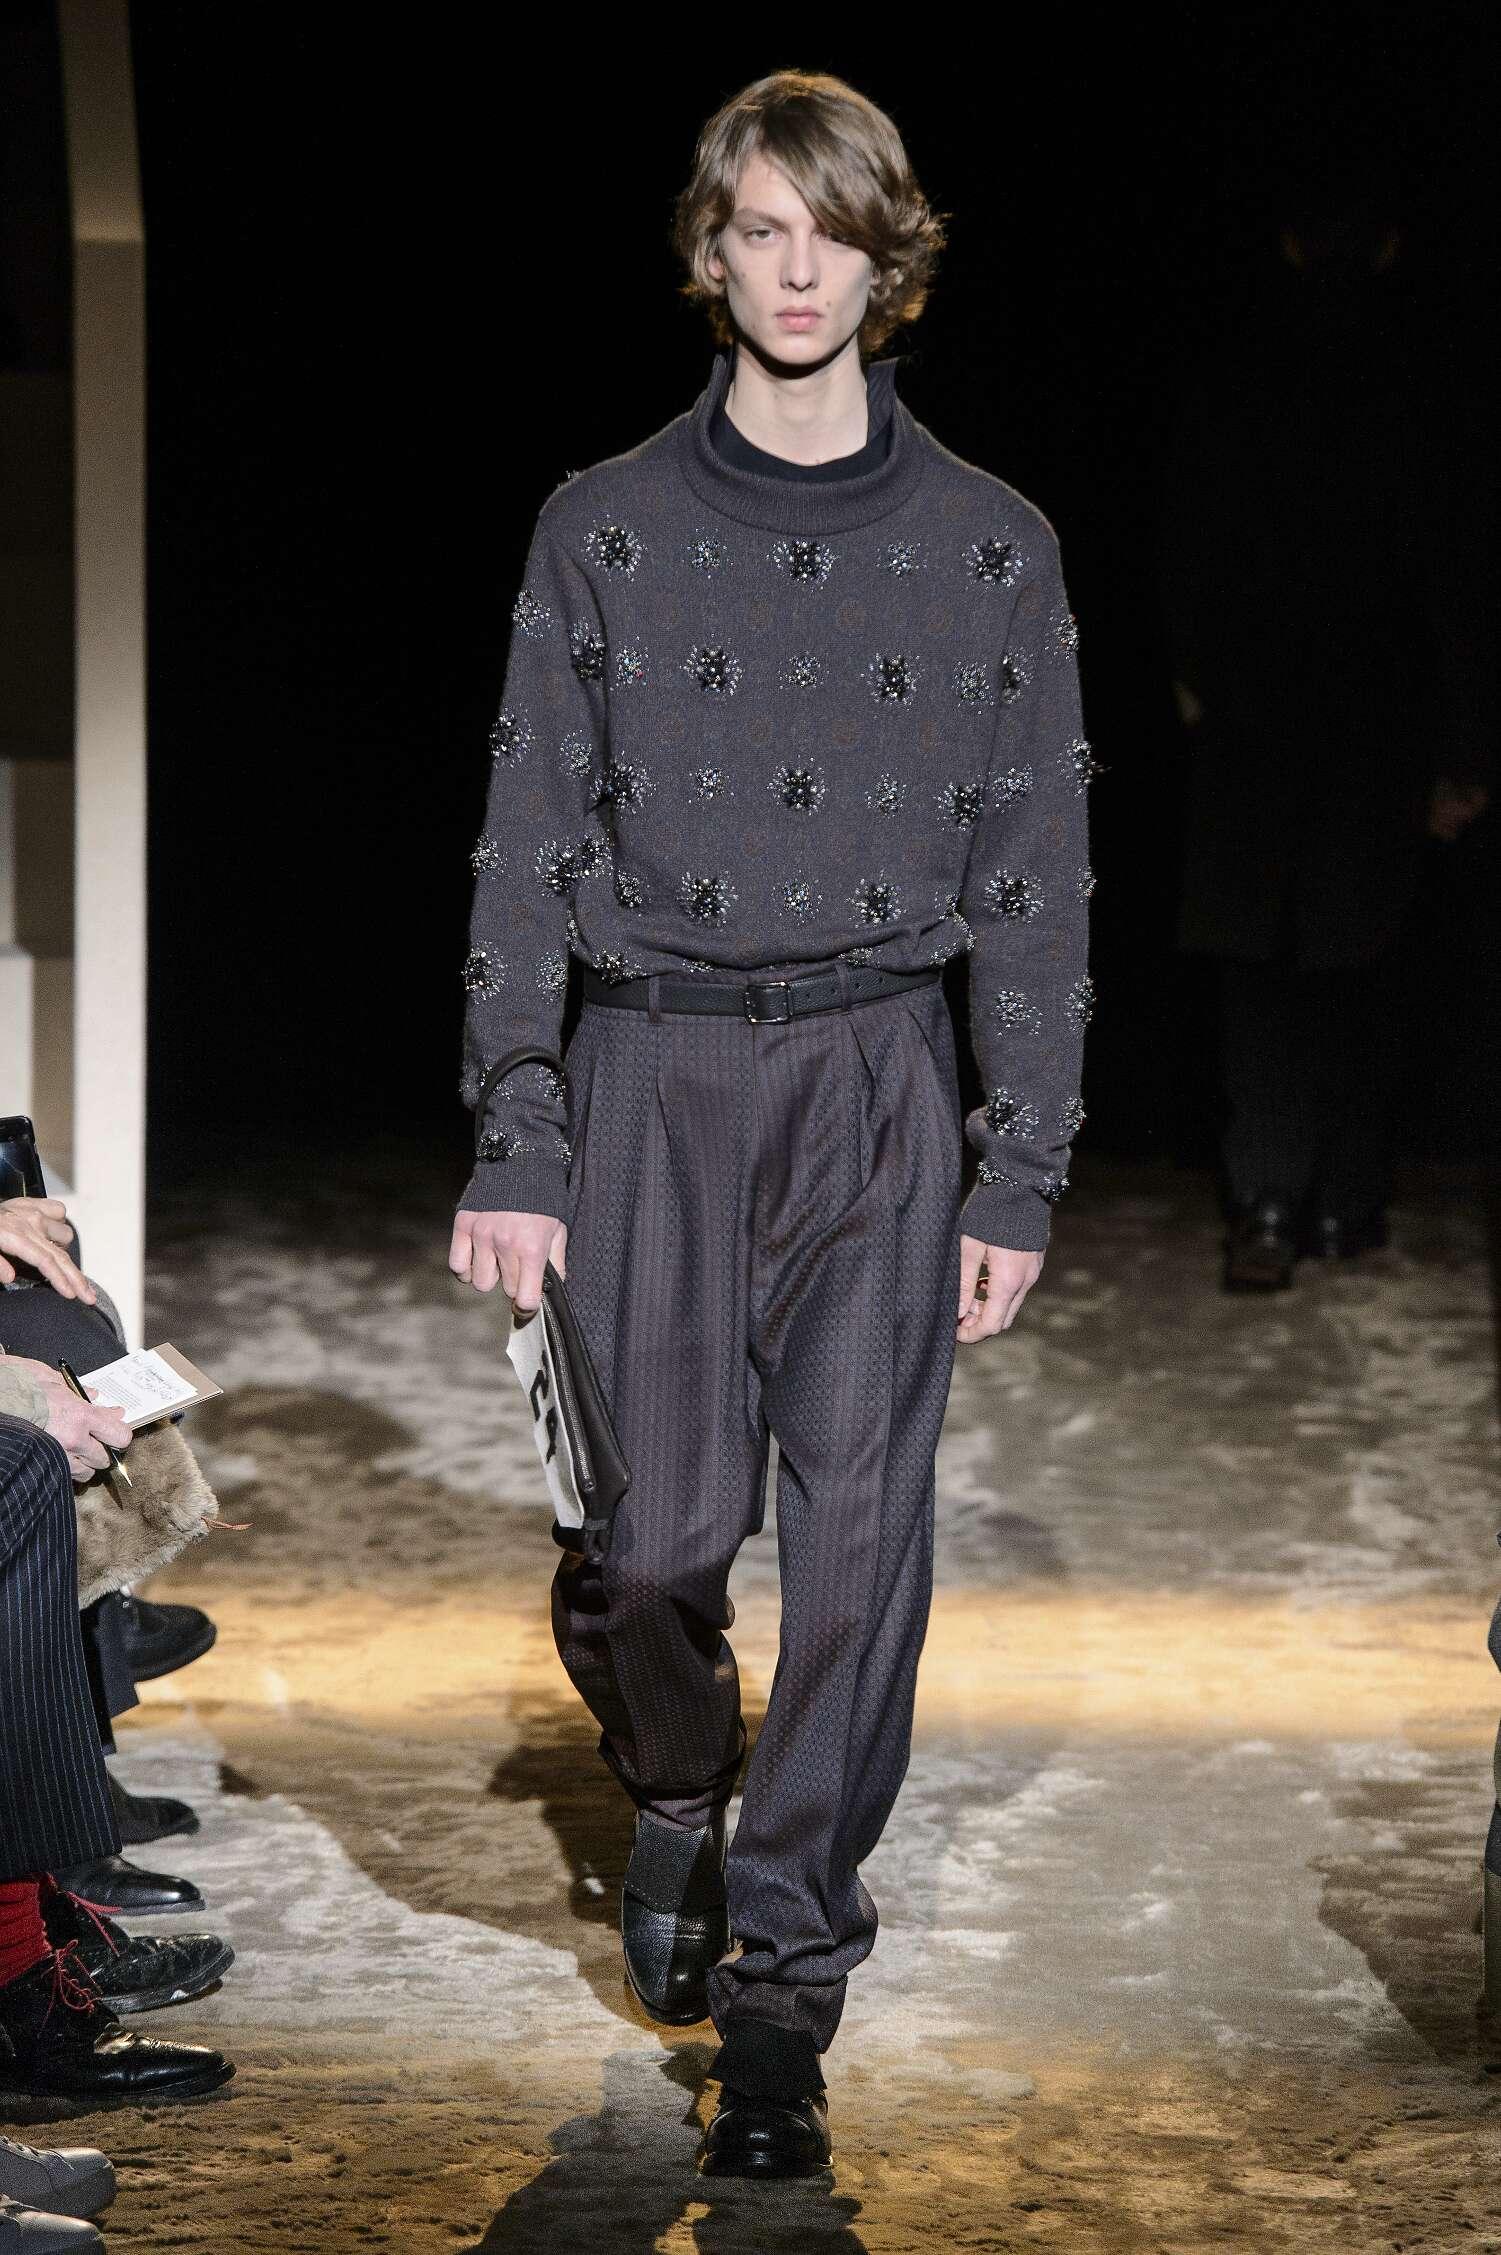 Ermenegildo Zegna Couture Fall 2016 Catwalk